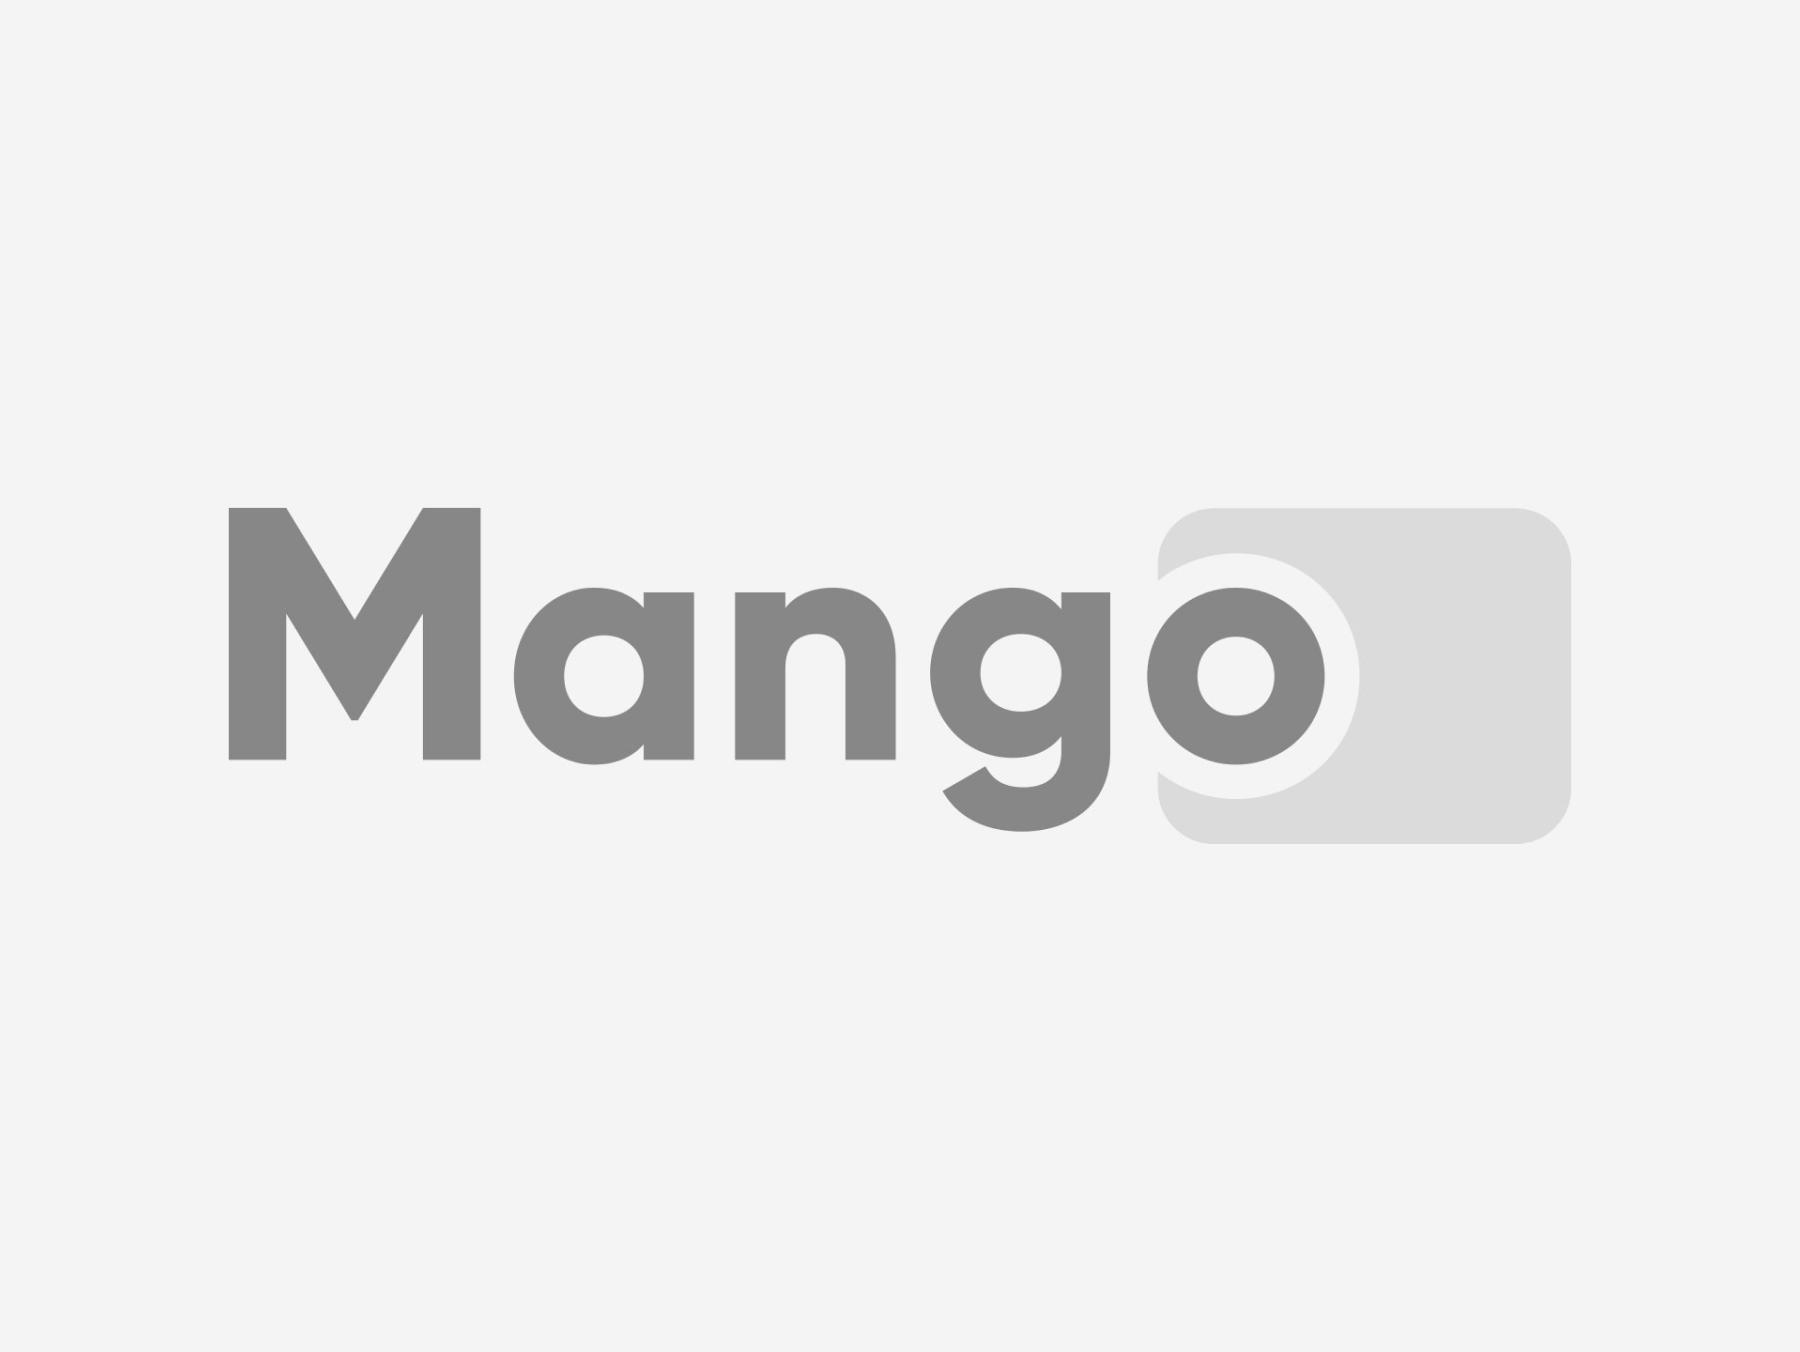 Strike Paleta Tenis de Masa Spokey